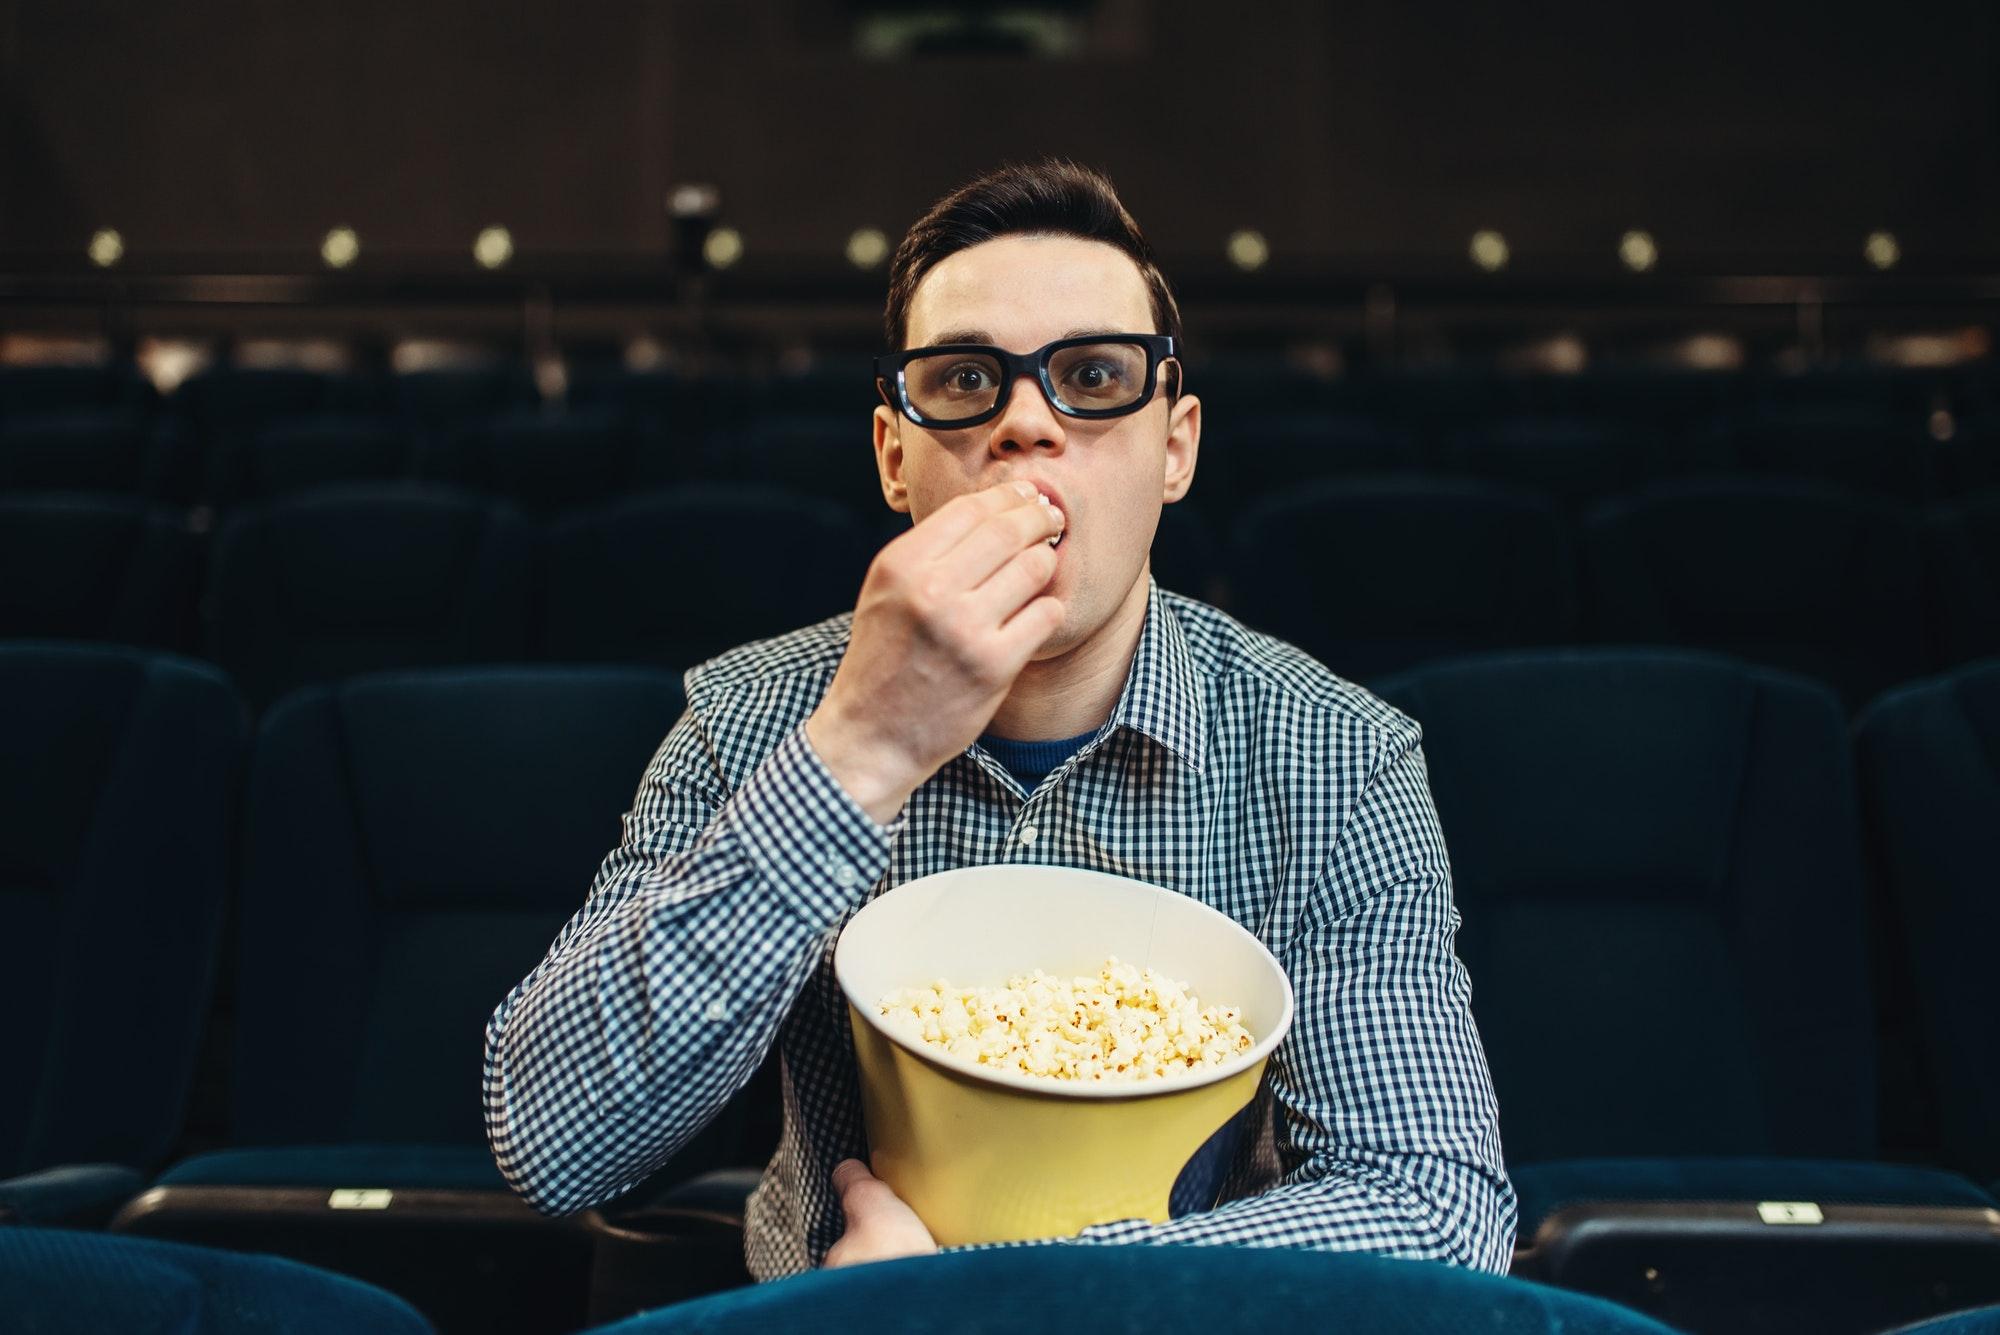 Teenager fascinated watching the film in cinema